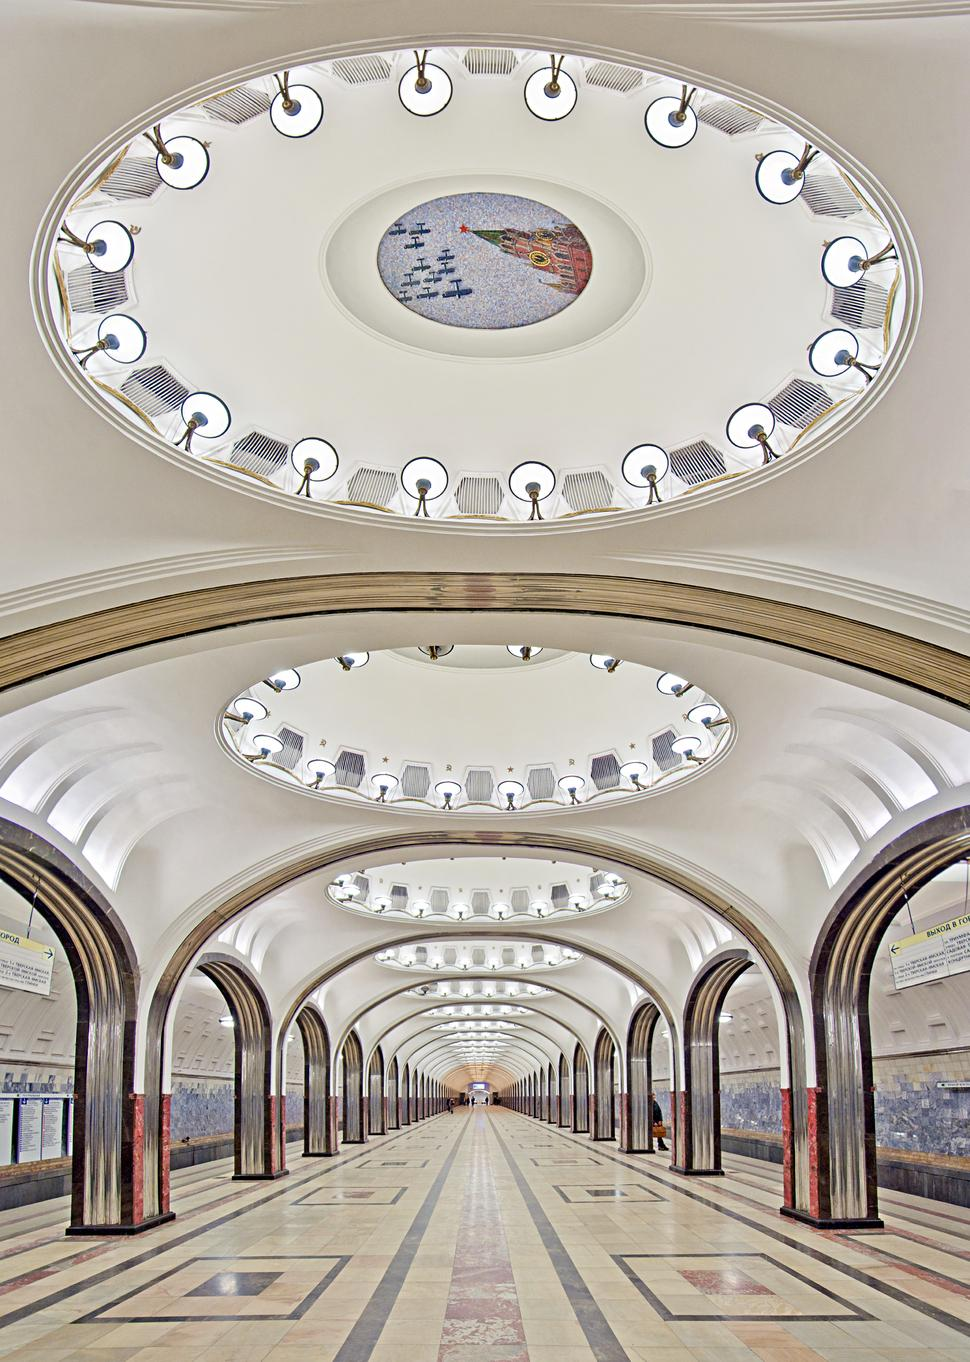 Mayakovskaya Station, built in 1939. http://t.co/xcf5wwTwGu